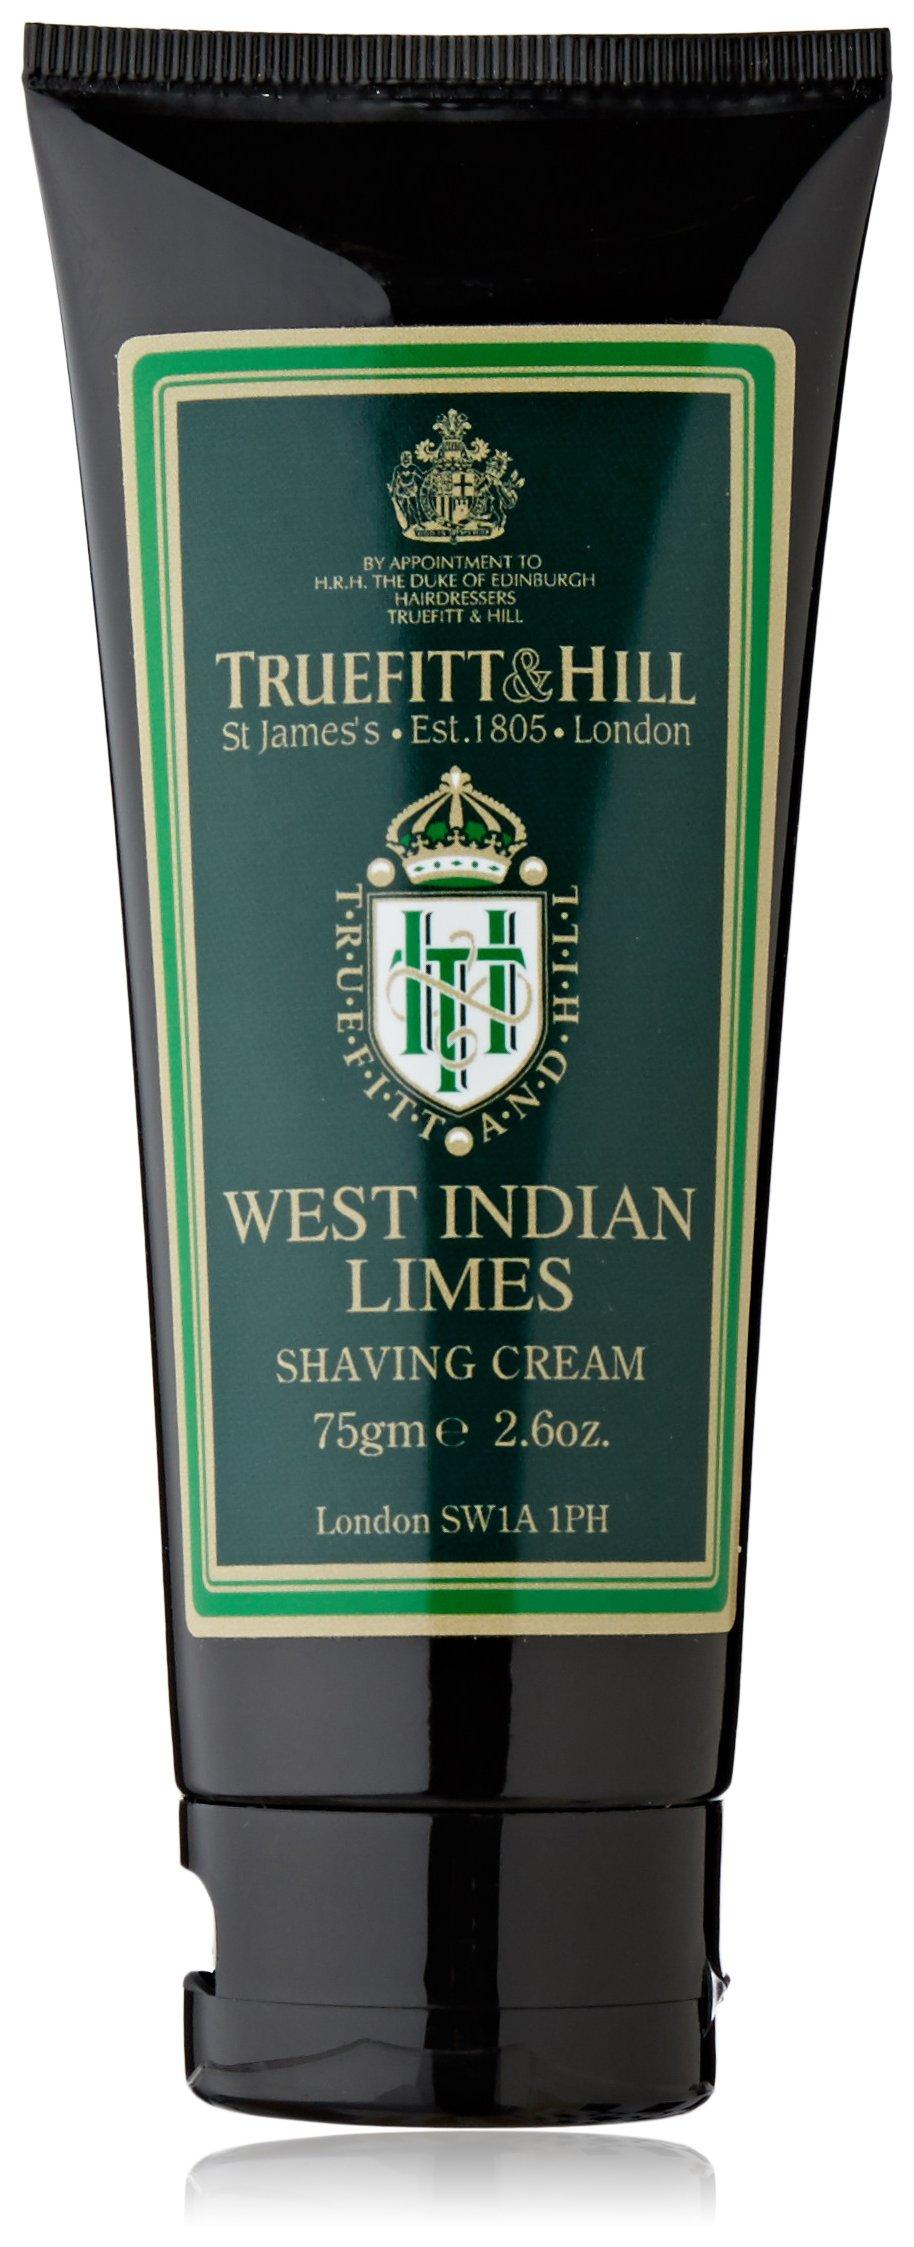 Truefitt & Hill West Indian Limes Shaving Cream Travel Tube (2.6 oz)